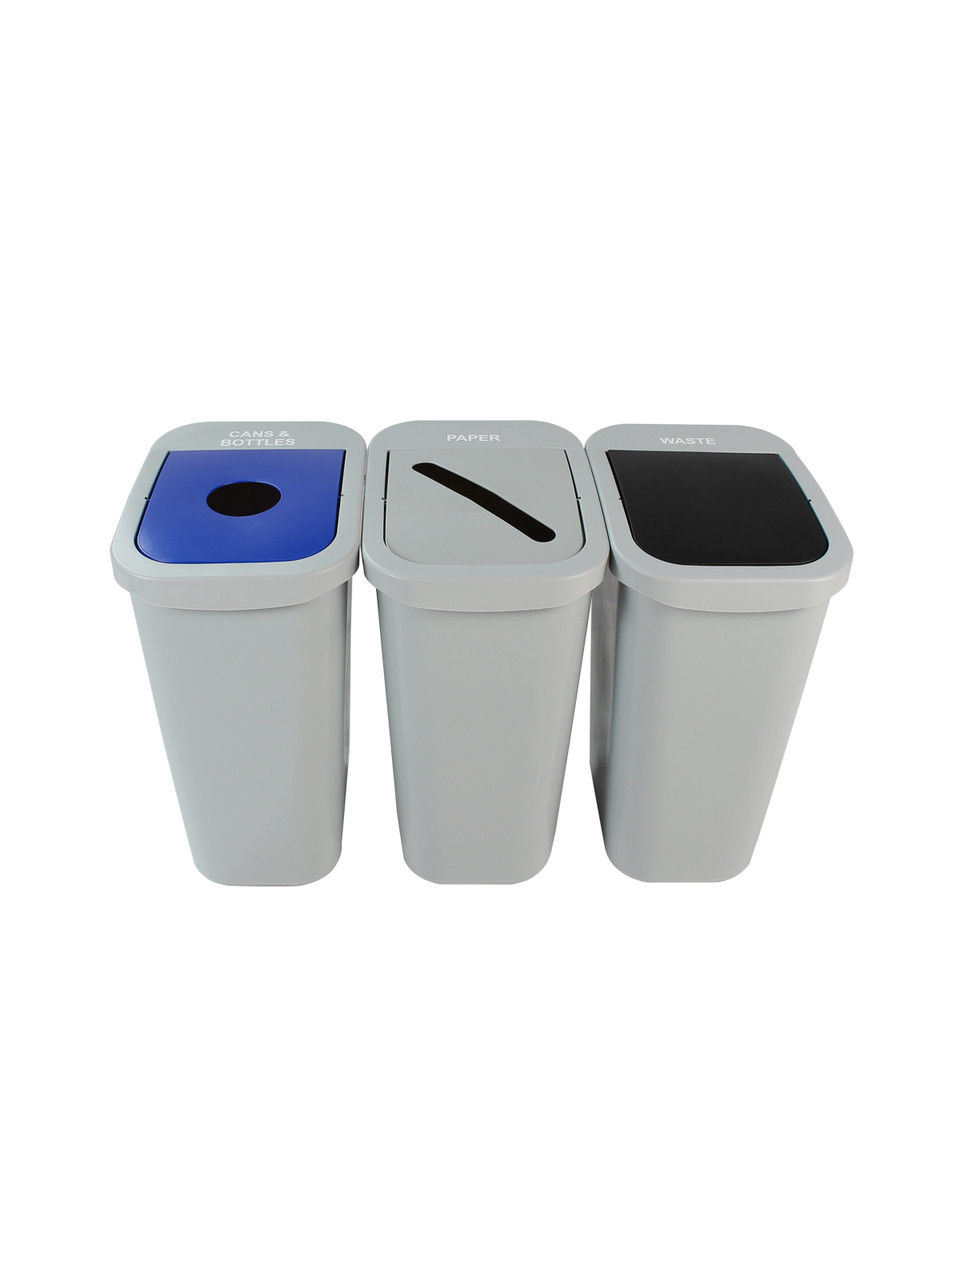 30 Gallon Billi Box Triple Trash Can Recycle Bin Center 8102029-134 (Circle, Paper, Waste Swing)